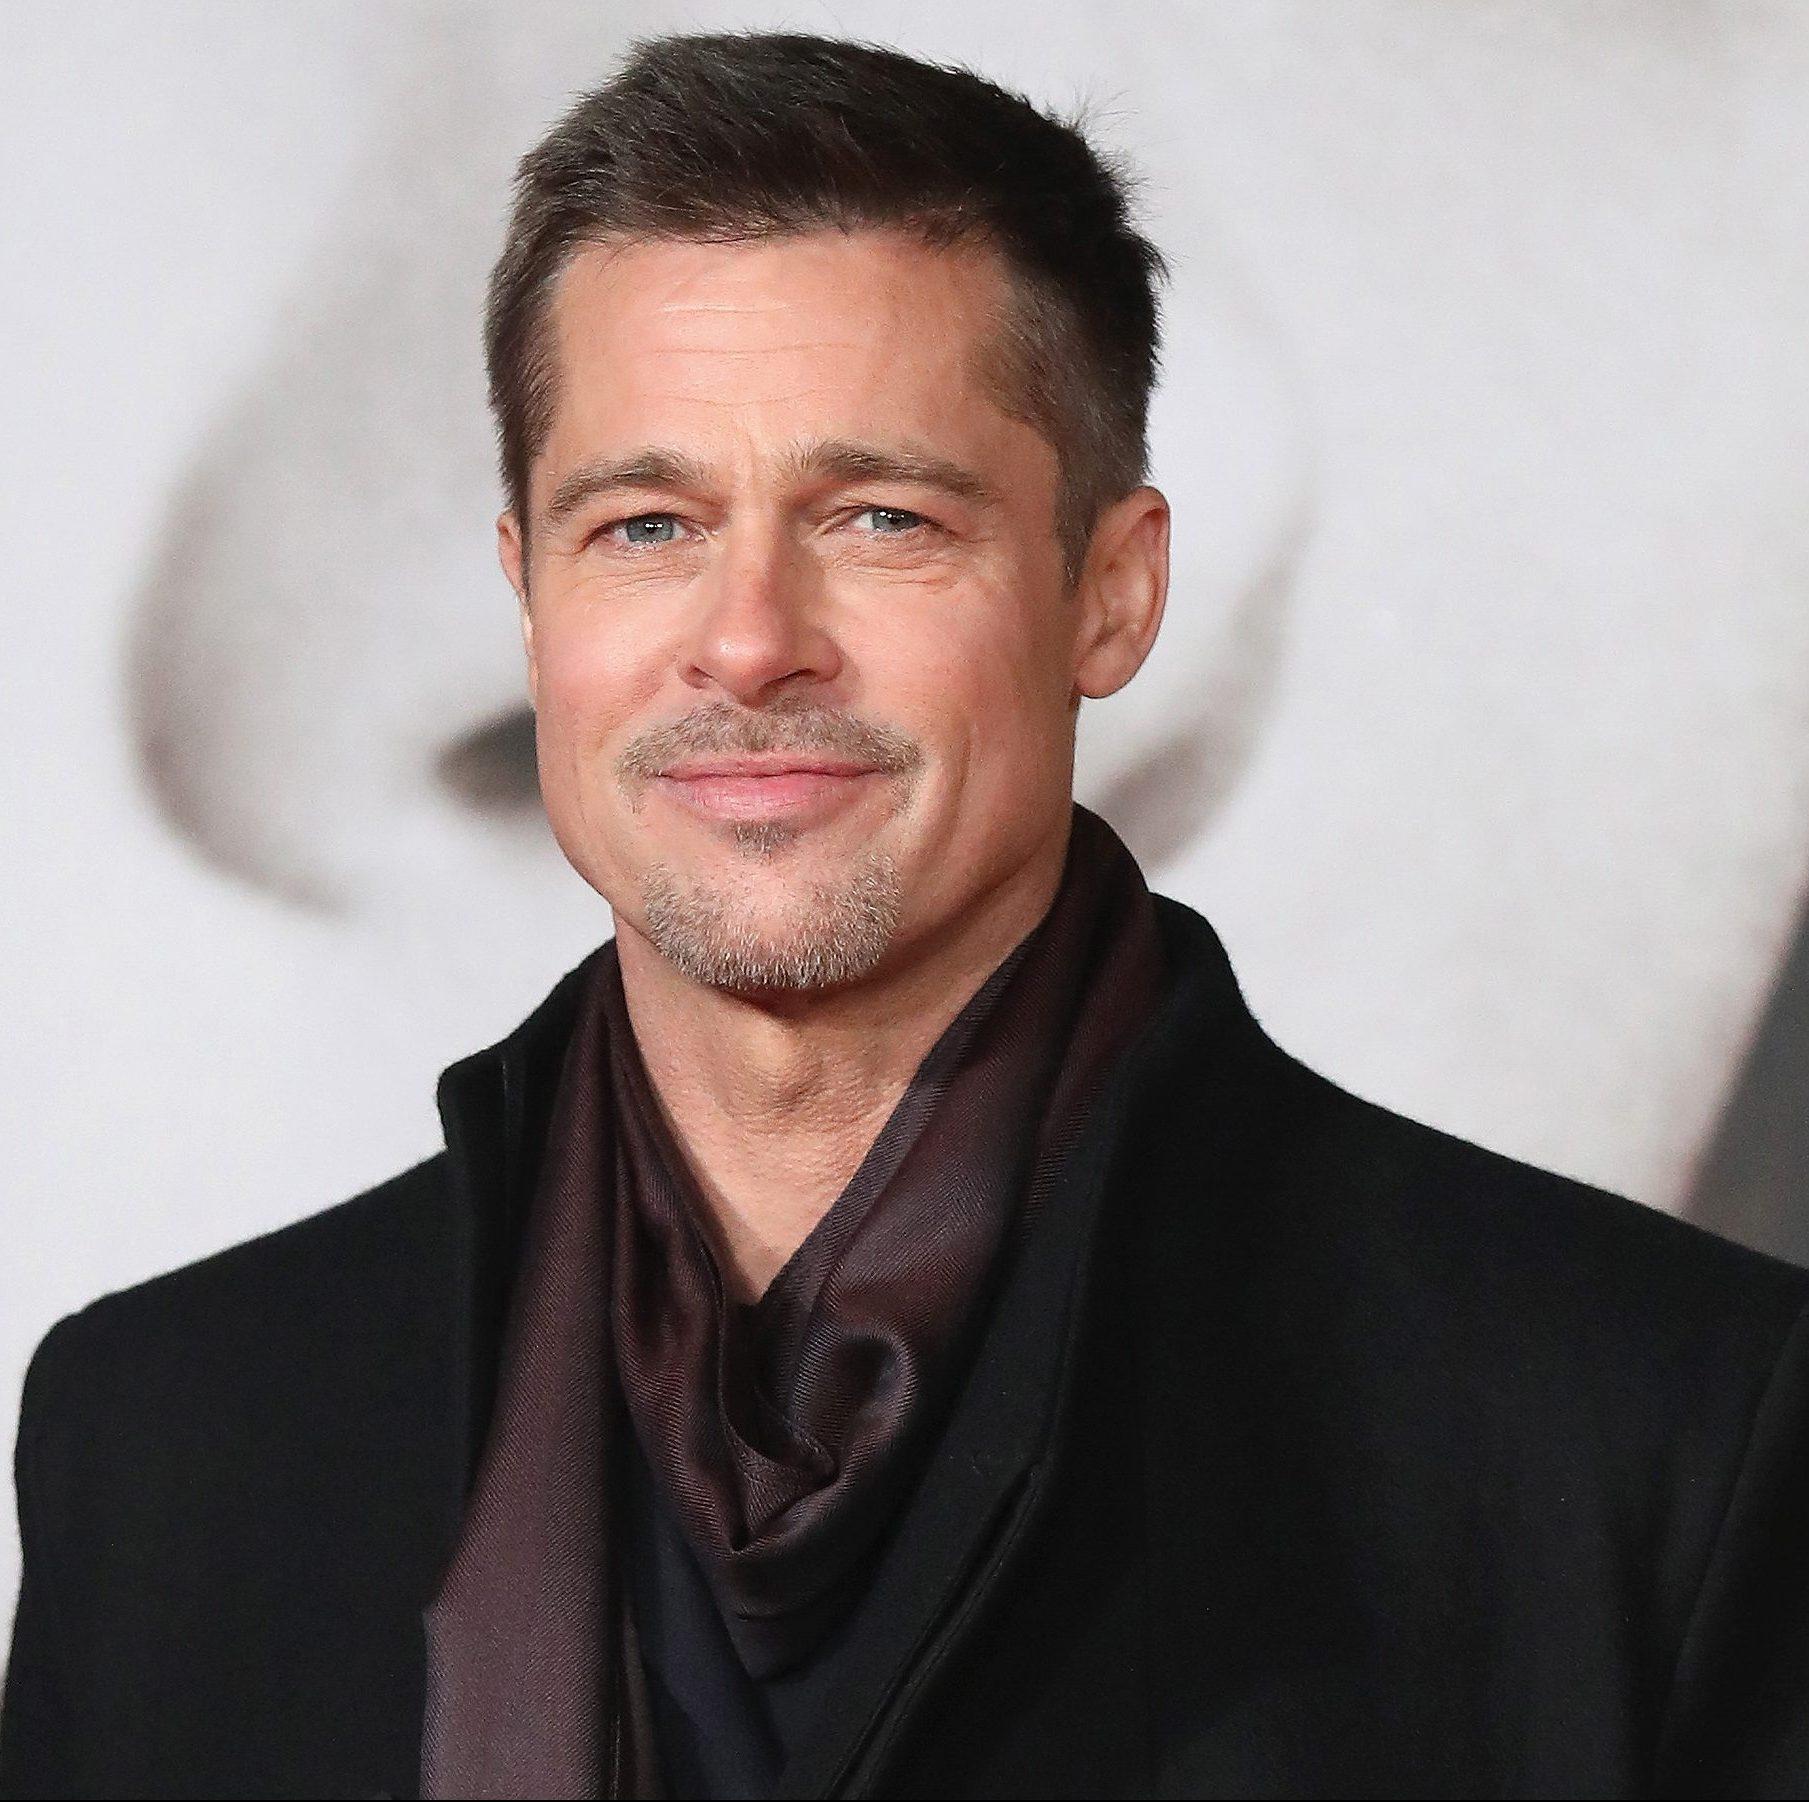 brad 21 e1564662904215 25 Things You Never Knew About Brad Pitt